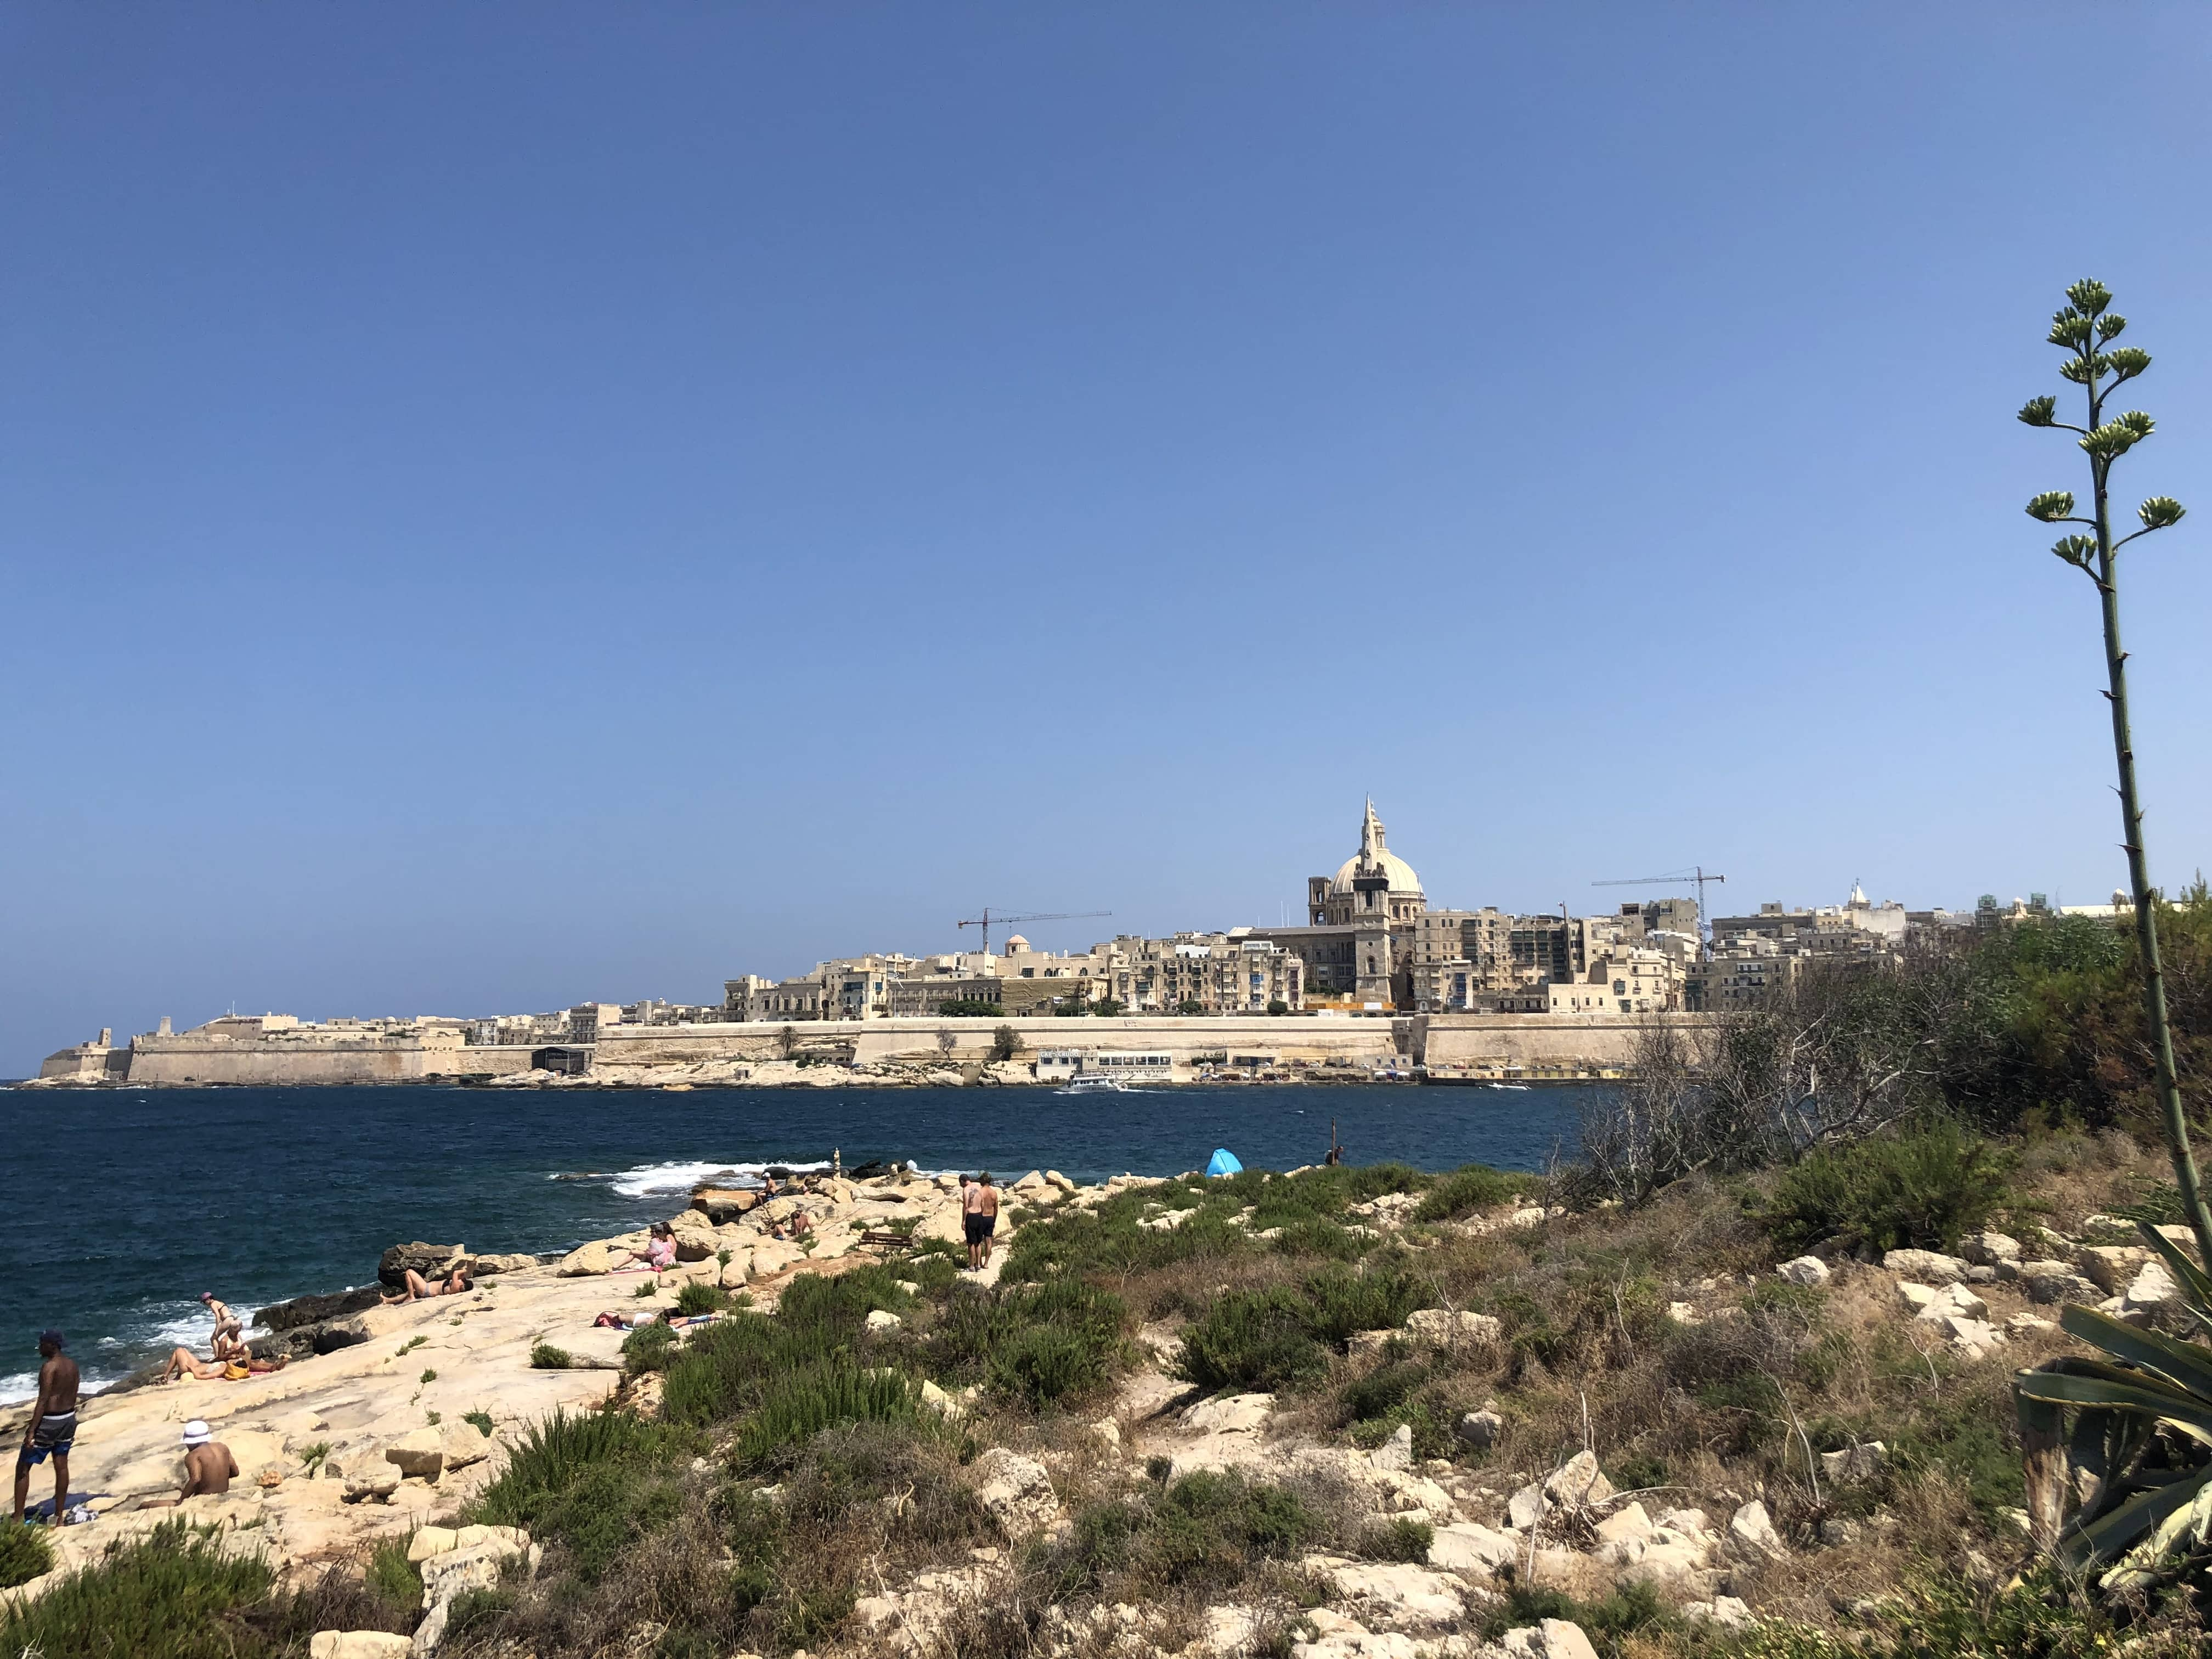 Cultural Malta – Sliema, Valletta and Mdina